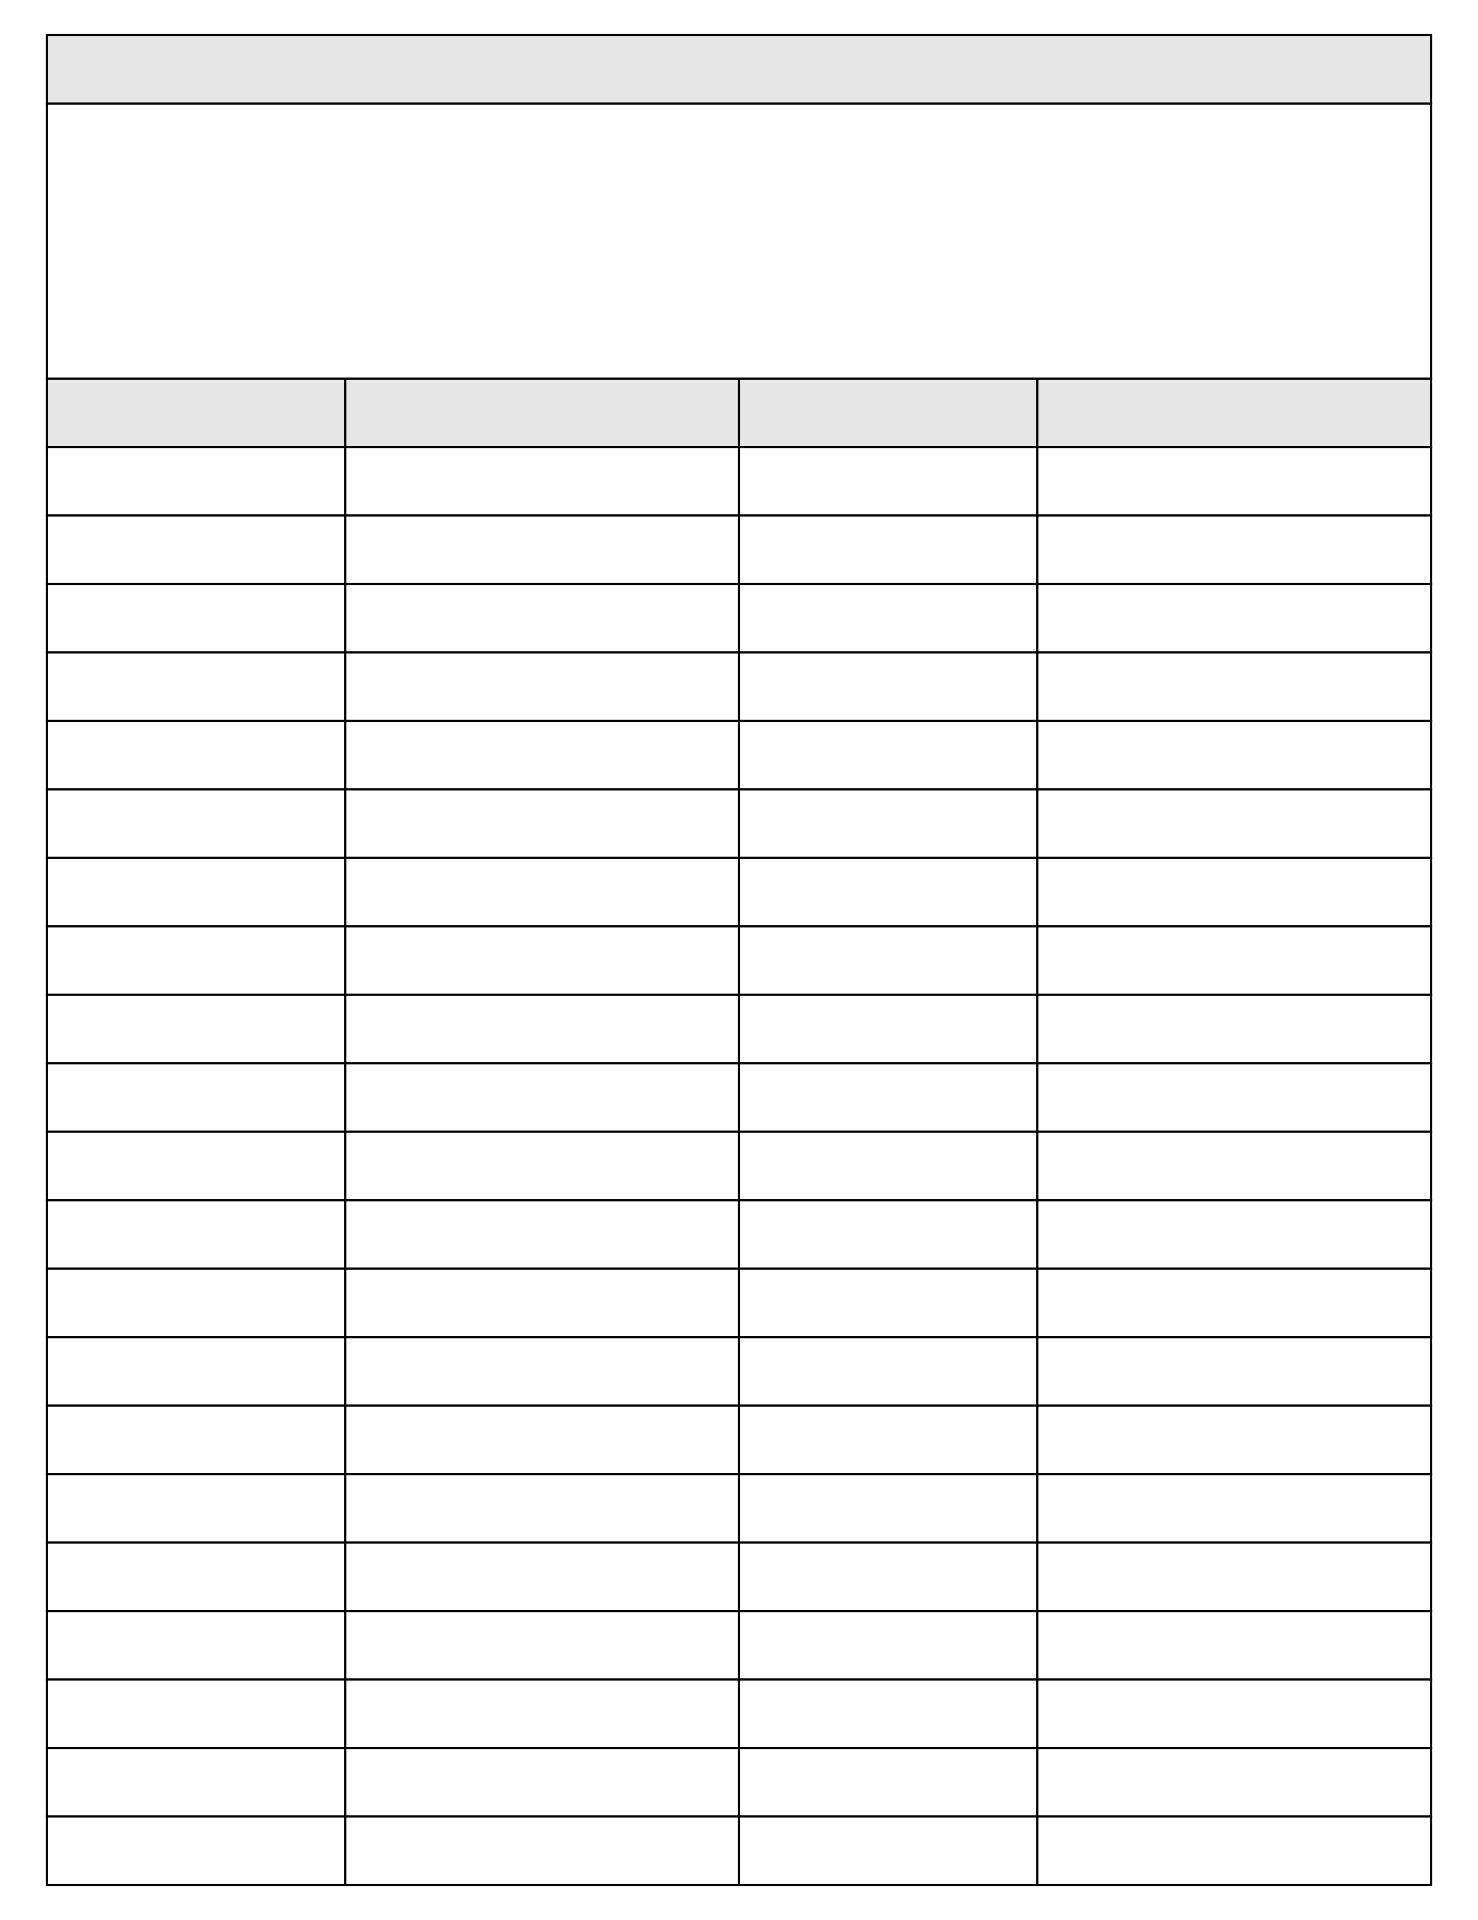 Blank Worksheet With Columns : Best images of column spreadsheet printable